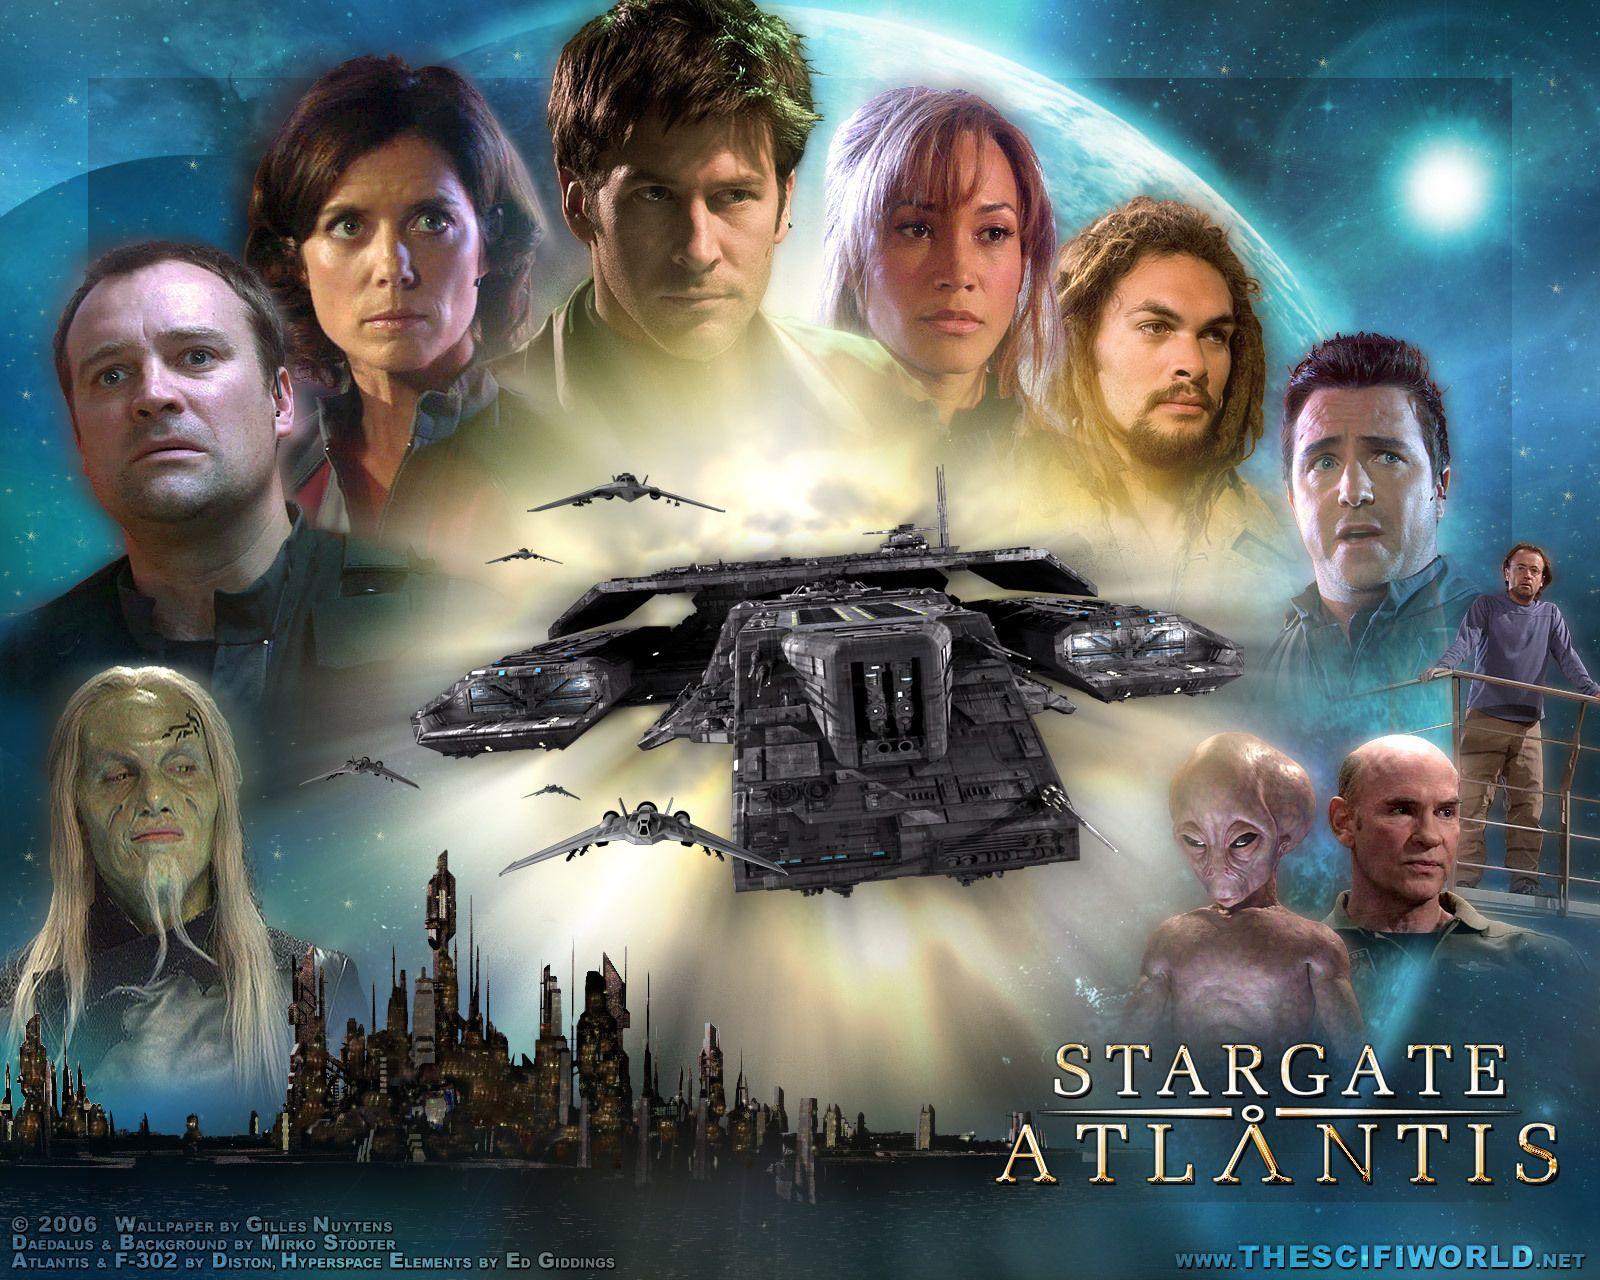 Stargate Atlantis Wallpaper Sga Stargate Atlantis Stargate Stargate Movie